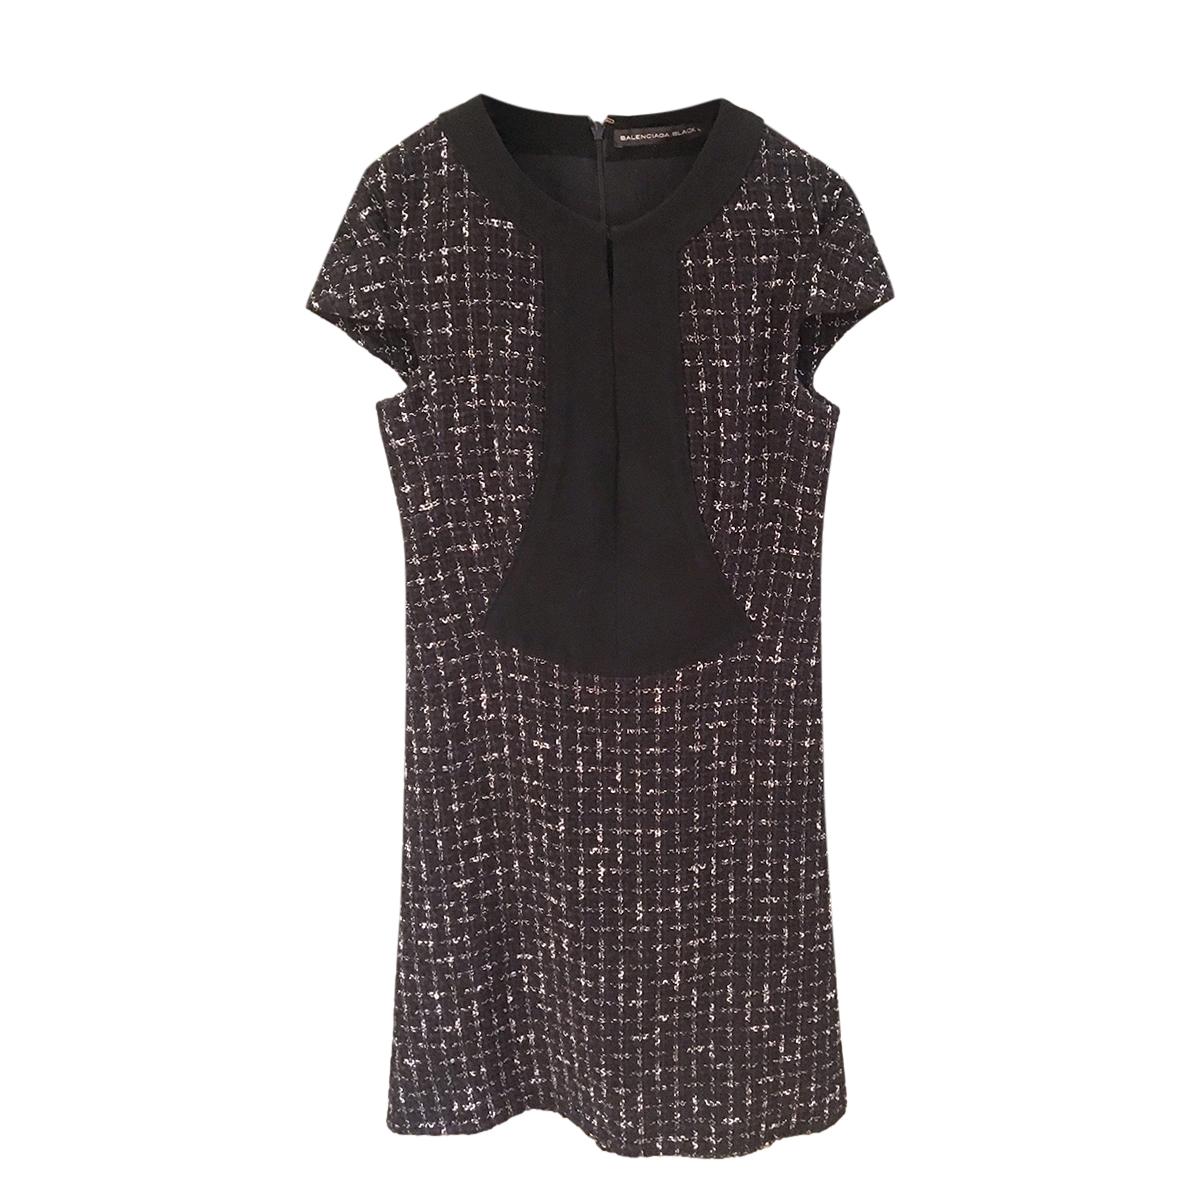 Balenciaga Black Tweed Shift Dress